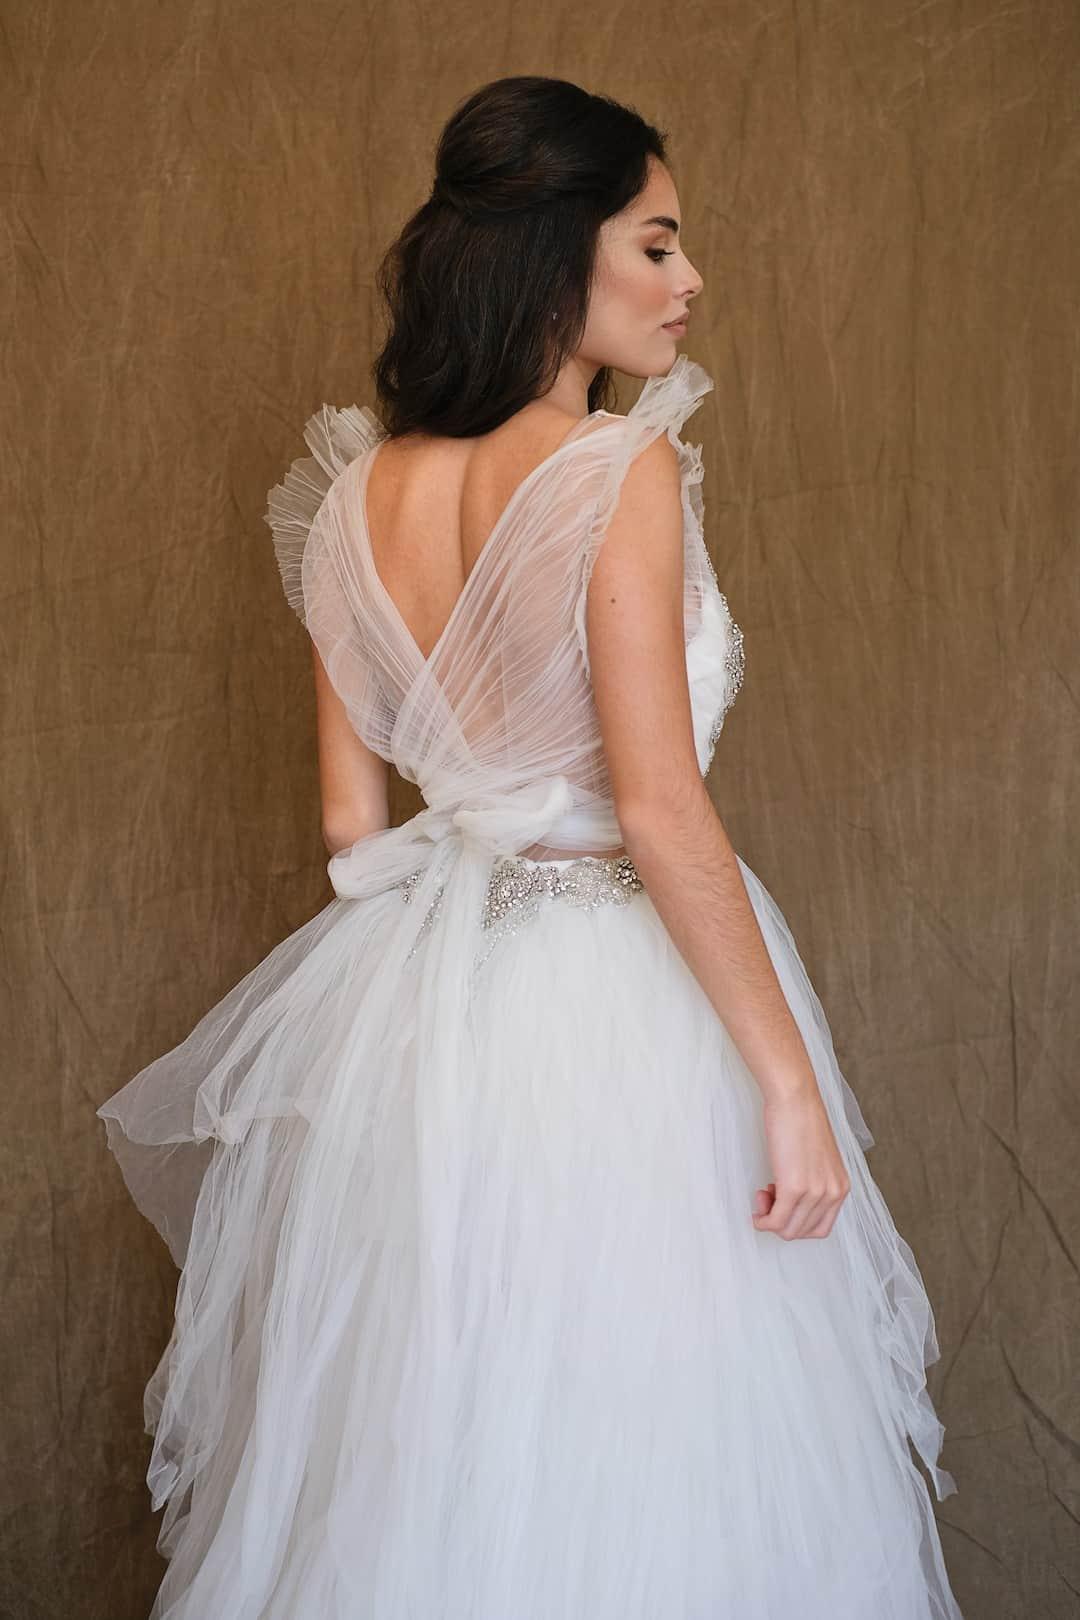 Romantic wedding dress - Marco&Maria - 14-1031-back